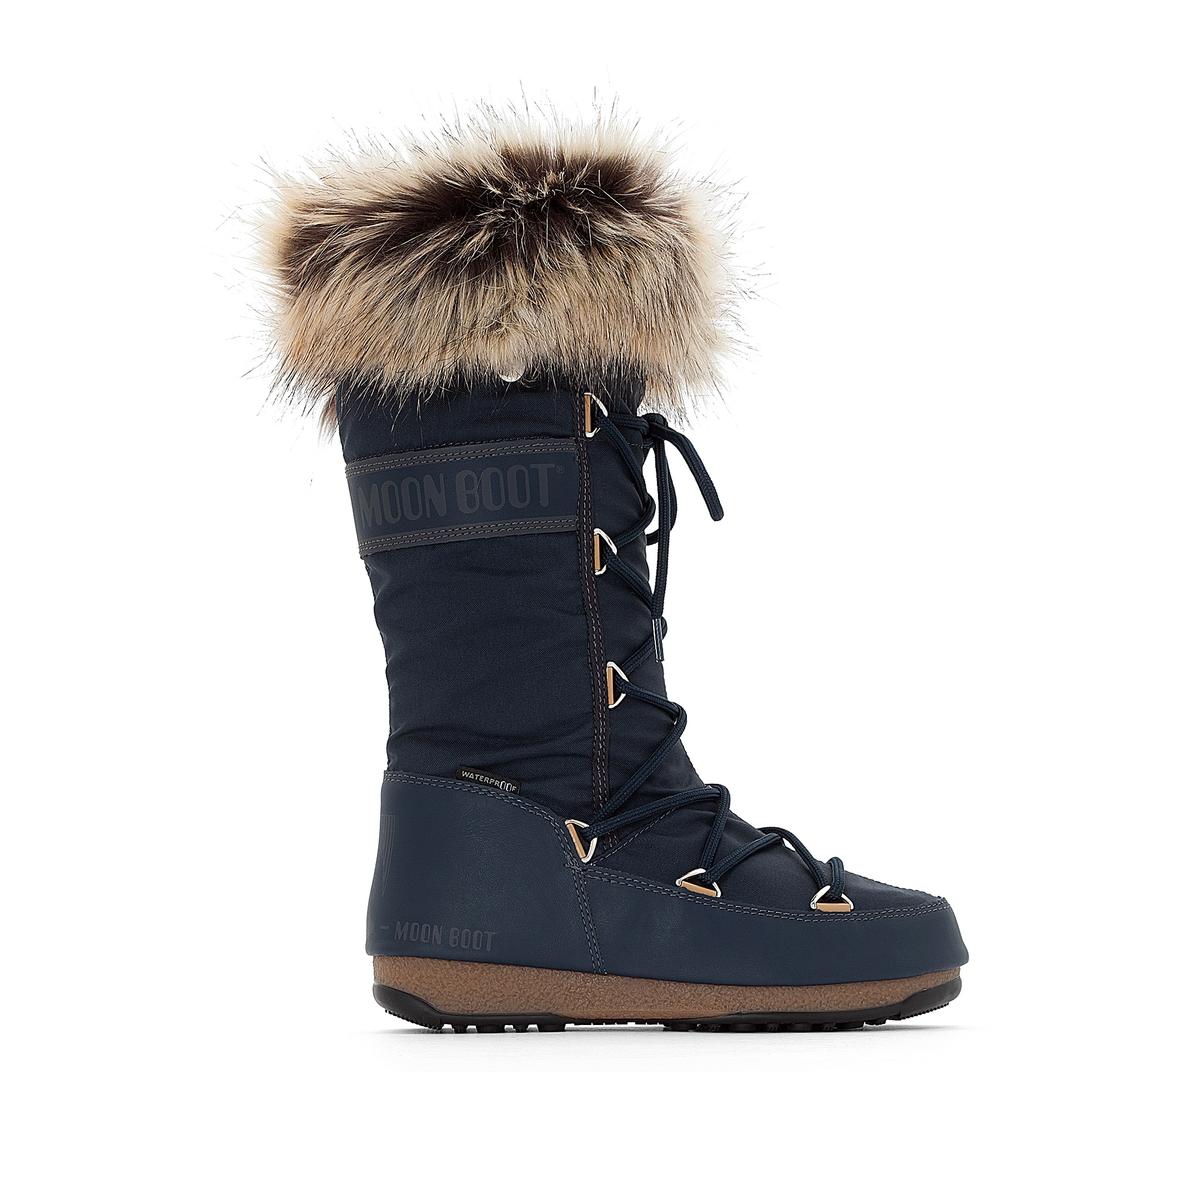 Сапоги на меху Monaco moon boot лыжная одежда